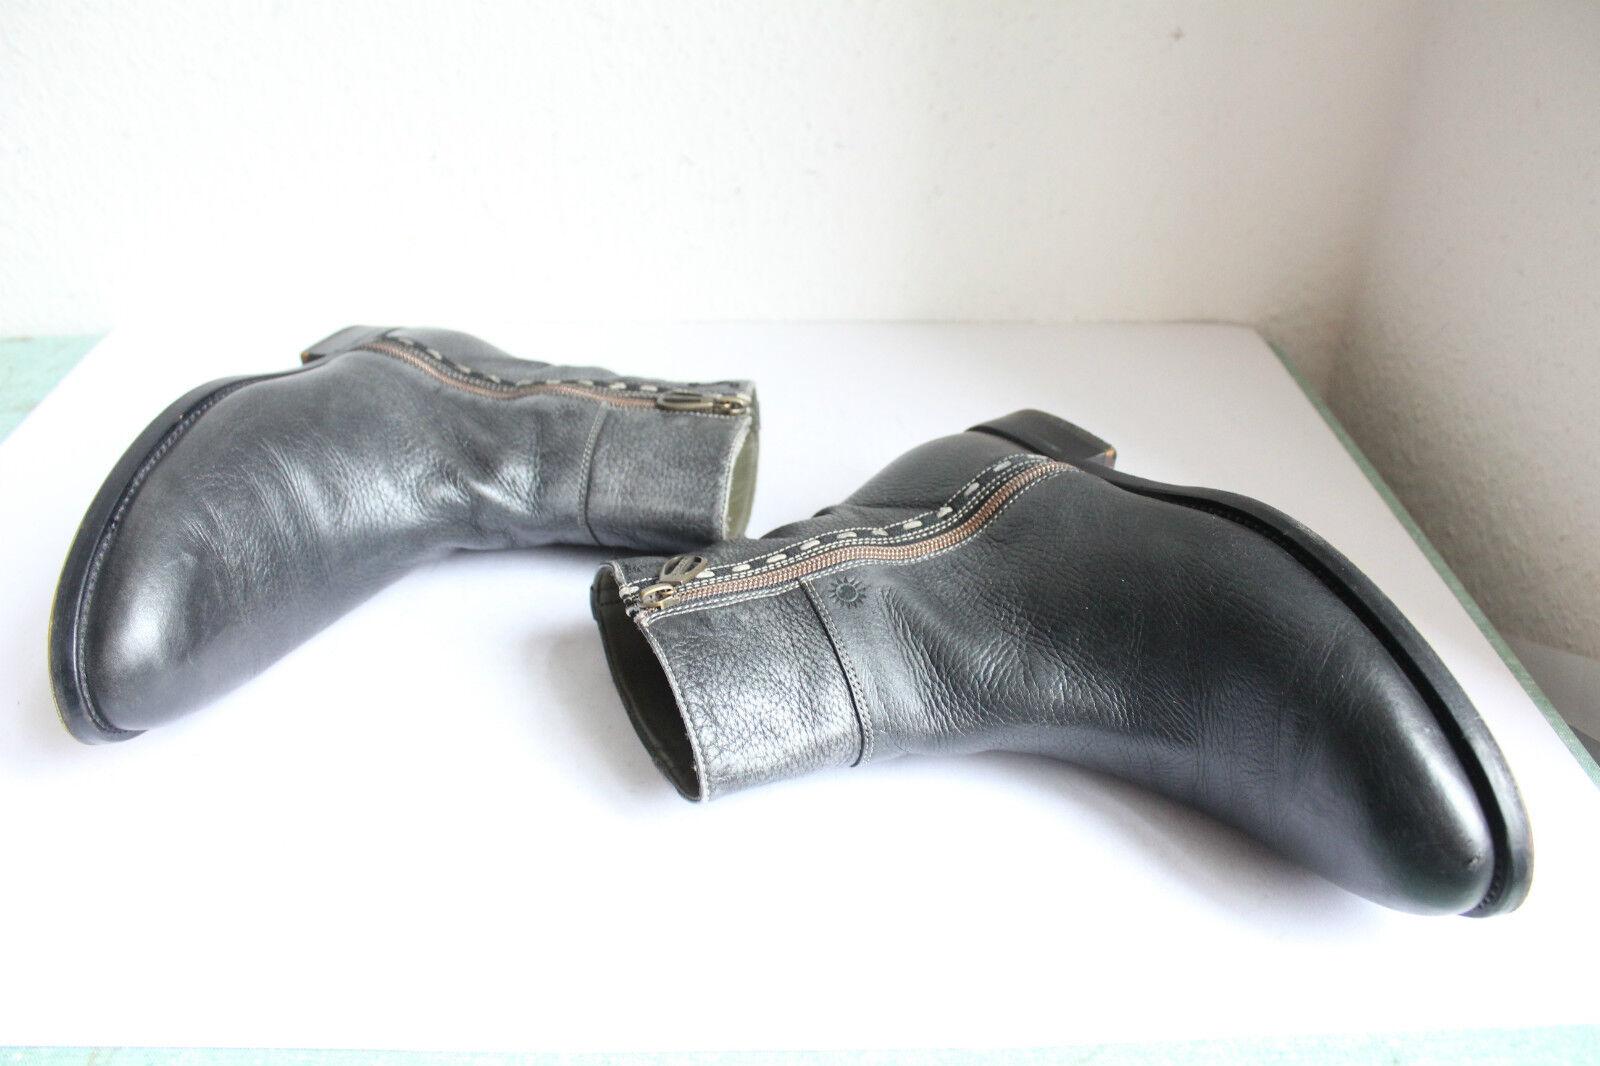 LA Martina Luxus Elegante Stiefel Stiefel Stiefel Voll Echtleder Grau-schwarz Eu 40-40,5-Top- 03e196